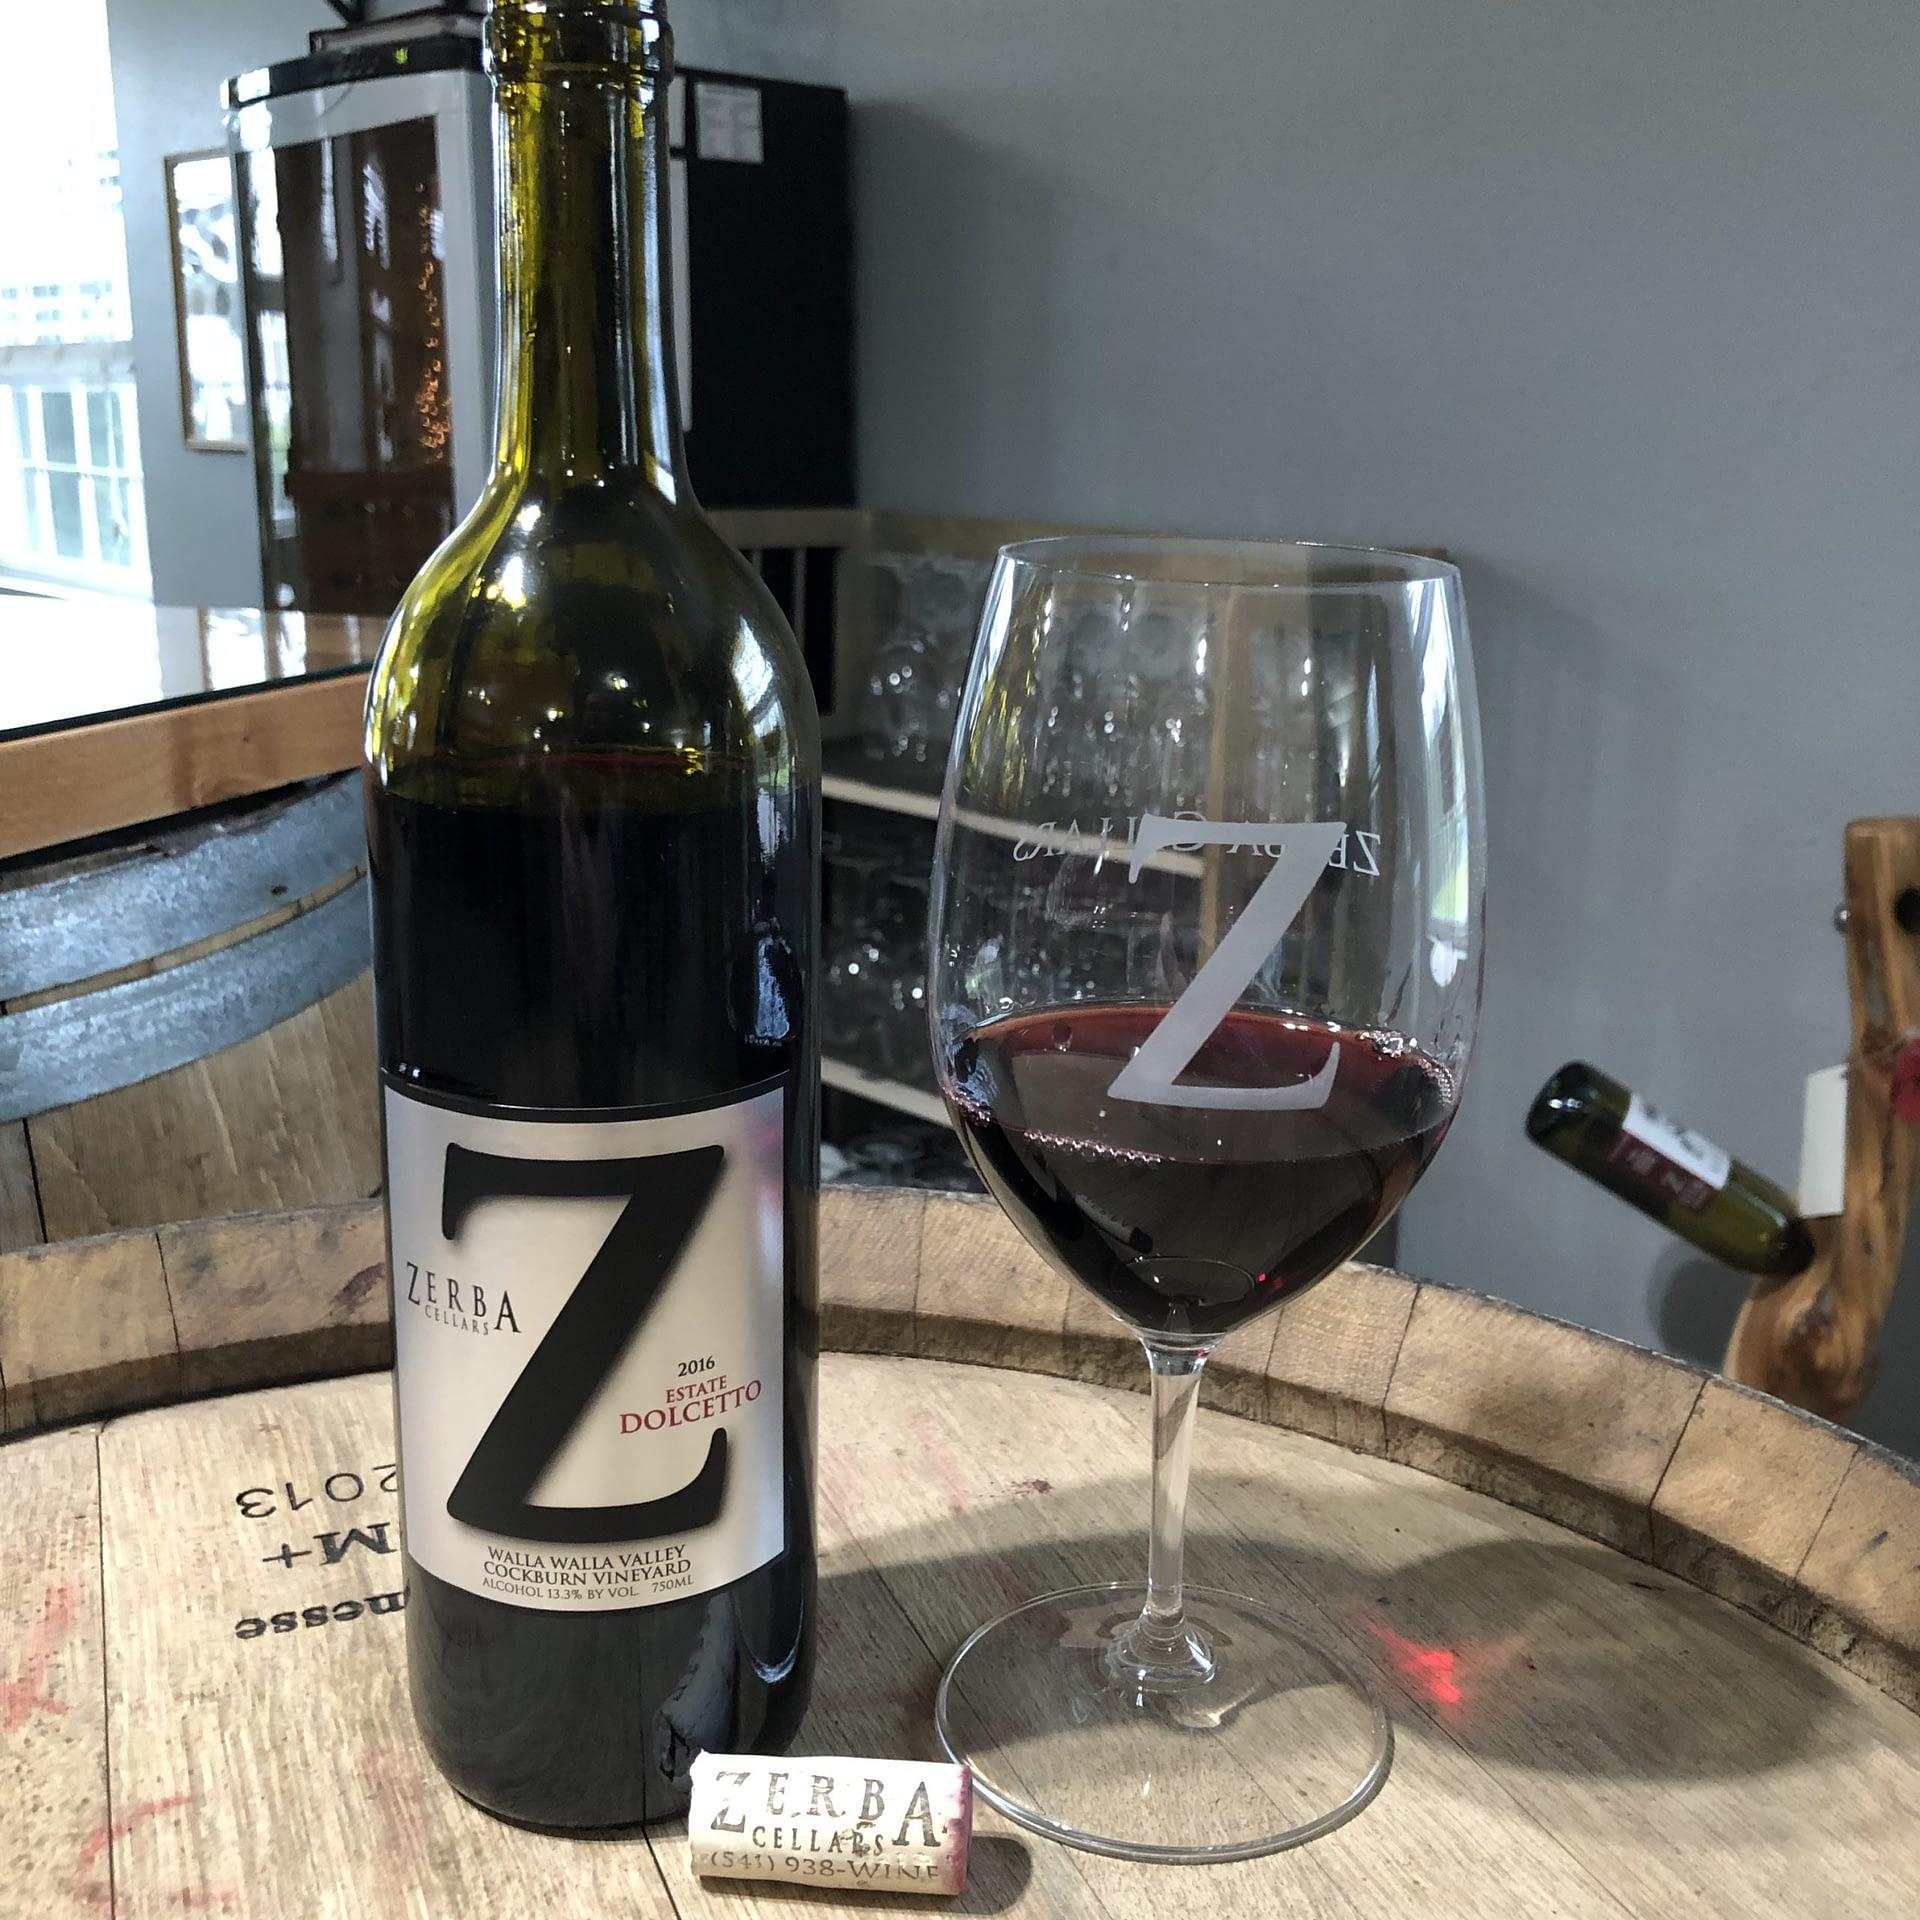 Zerba Wine Cellars Dolcitto wine bottle and glass